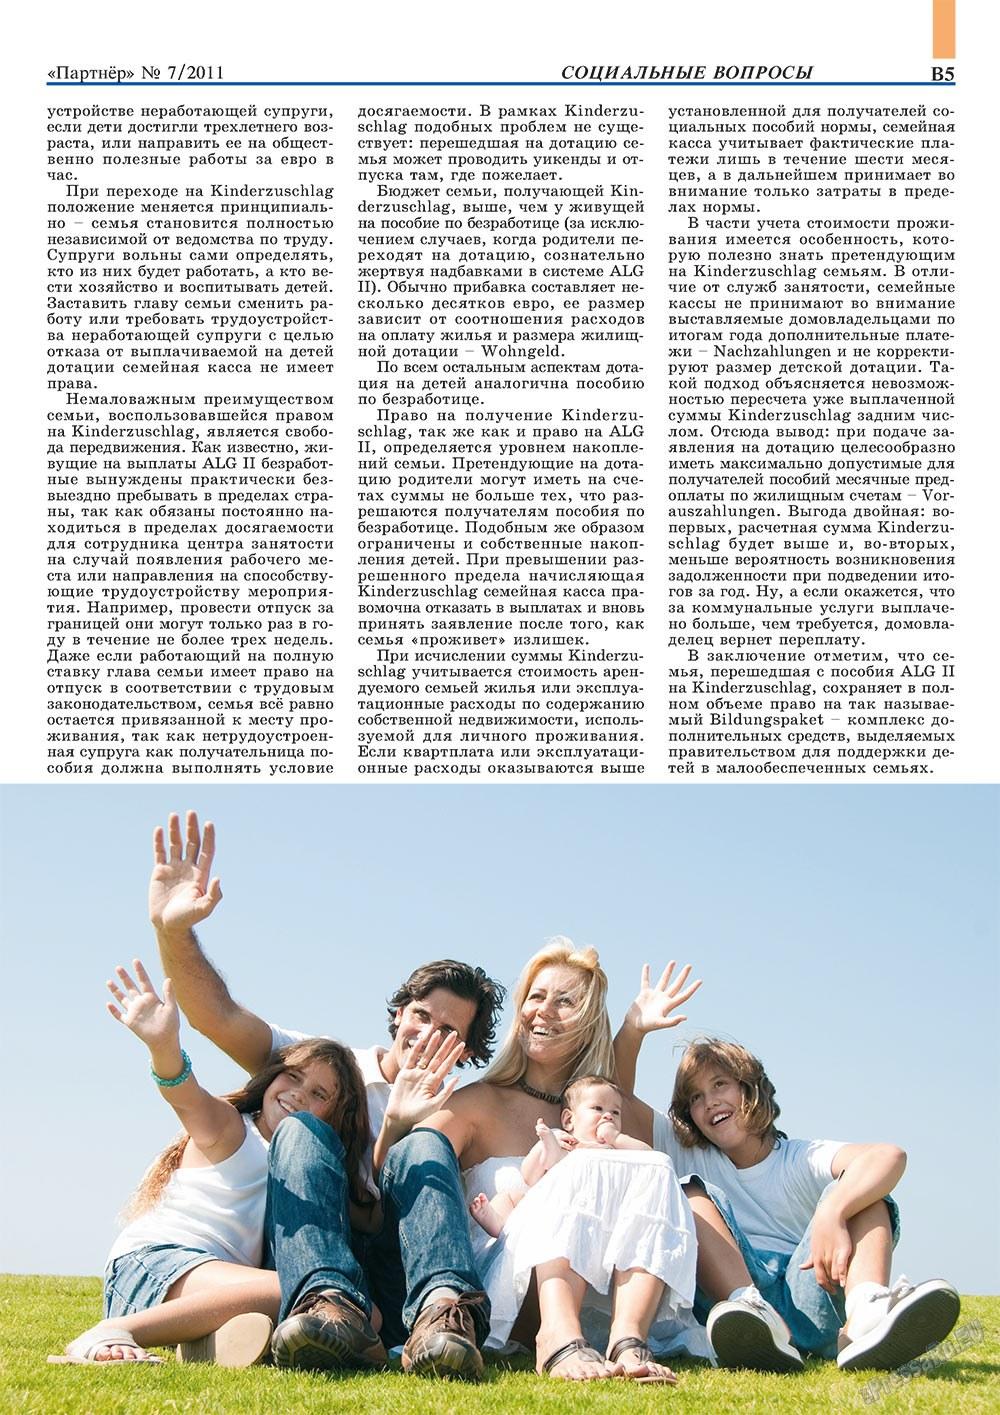 Партнер-север (журнал). 2011 год, номер 7, стр. 15